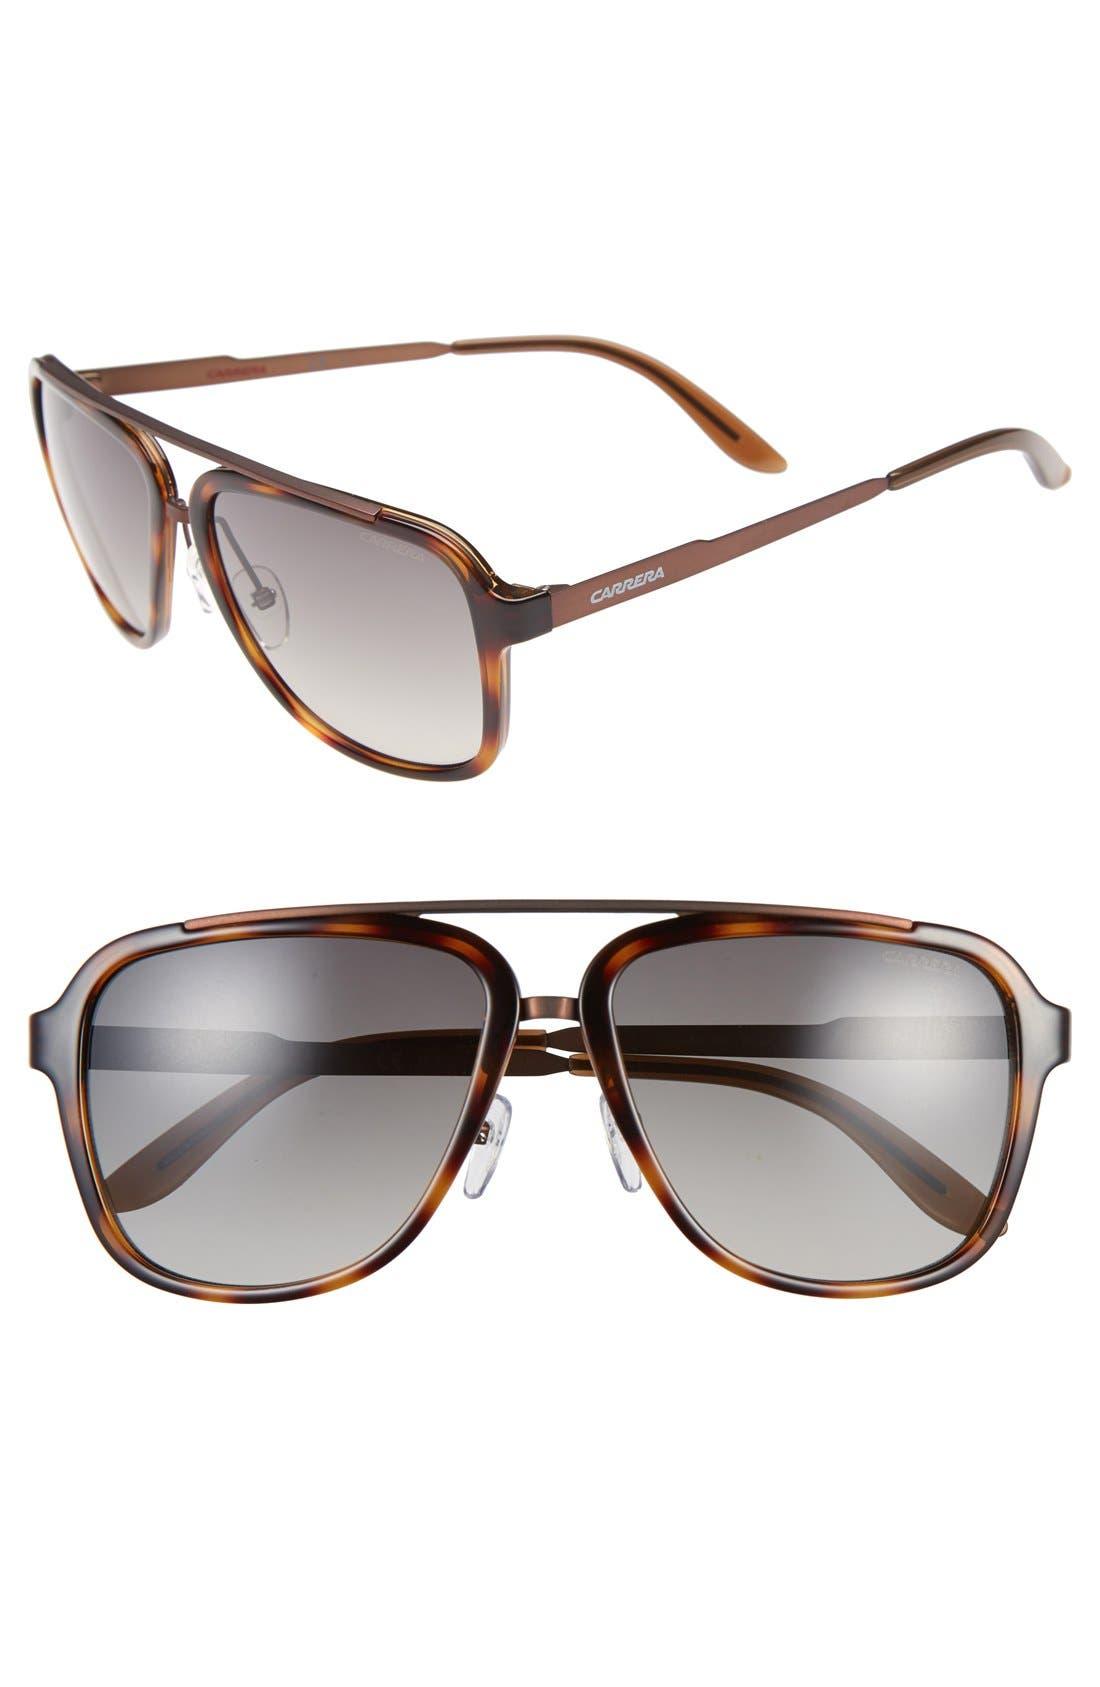 Alternate Image 1 Selected - Carrera Eyewear 57mm Navigator Sunglasses